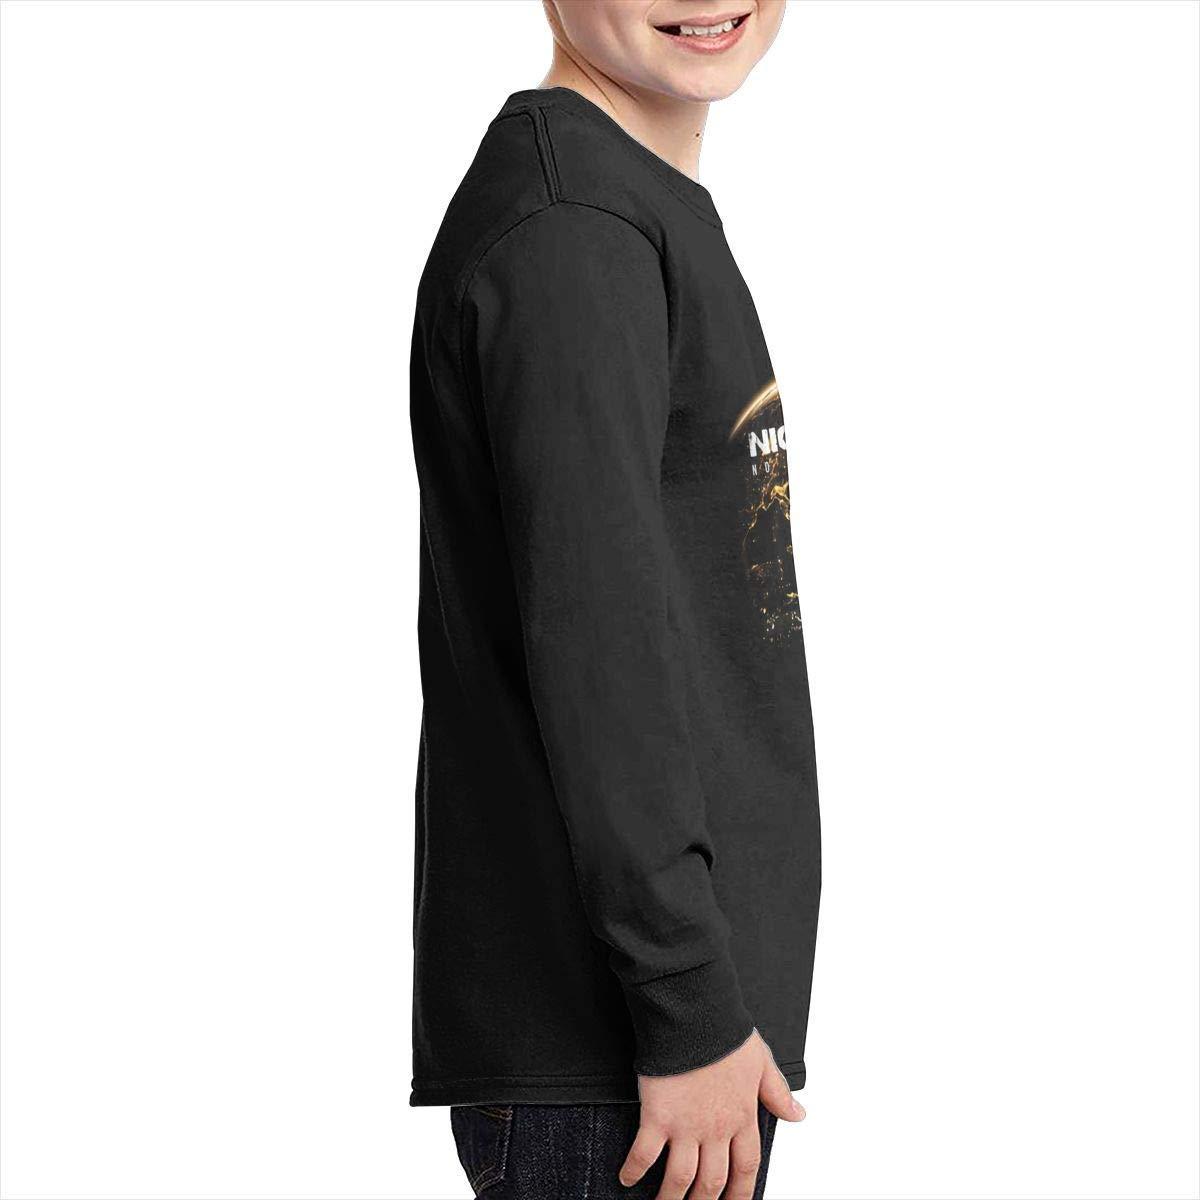 Kilsd Boys /& Girls Junior Fashion Nickelback Long Sleeve Tees Black